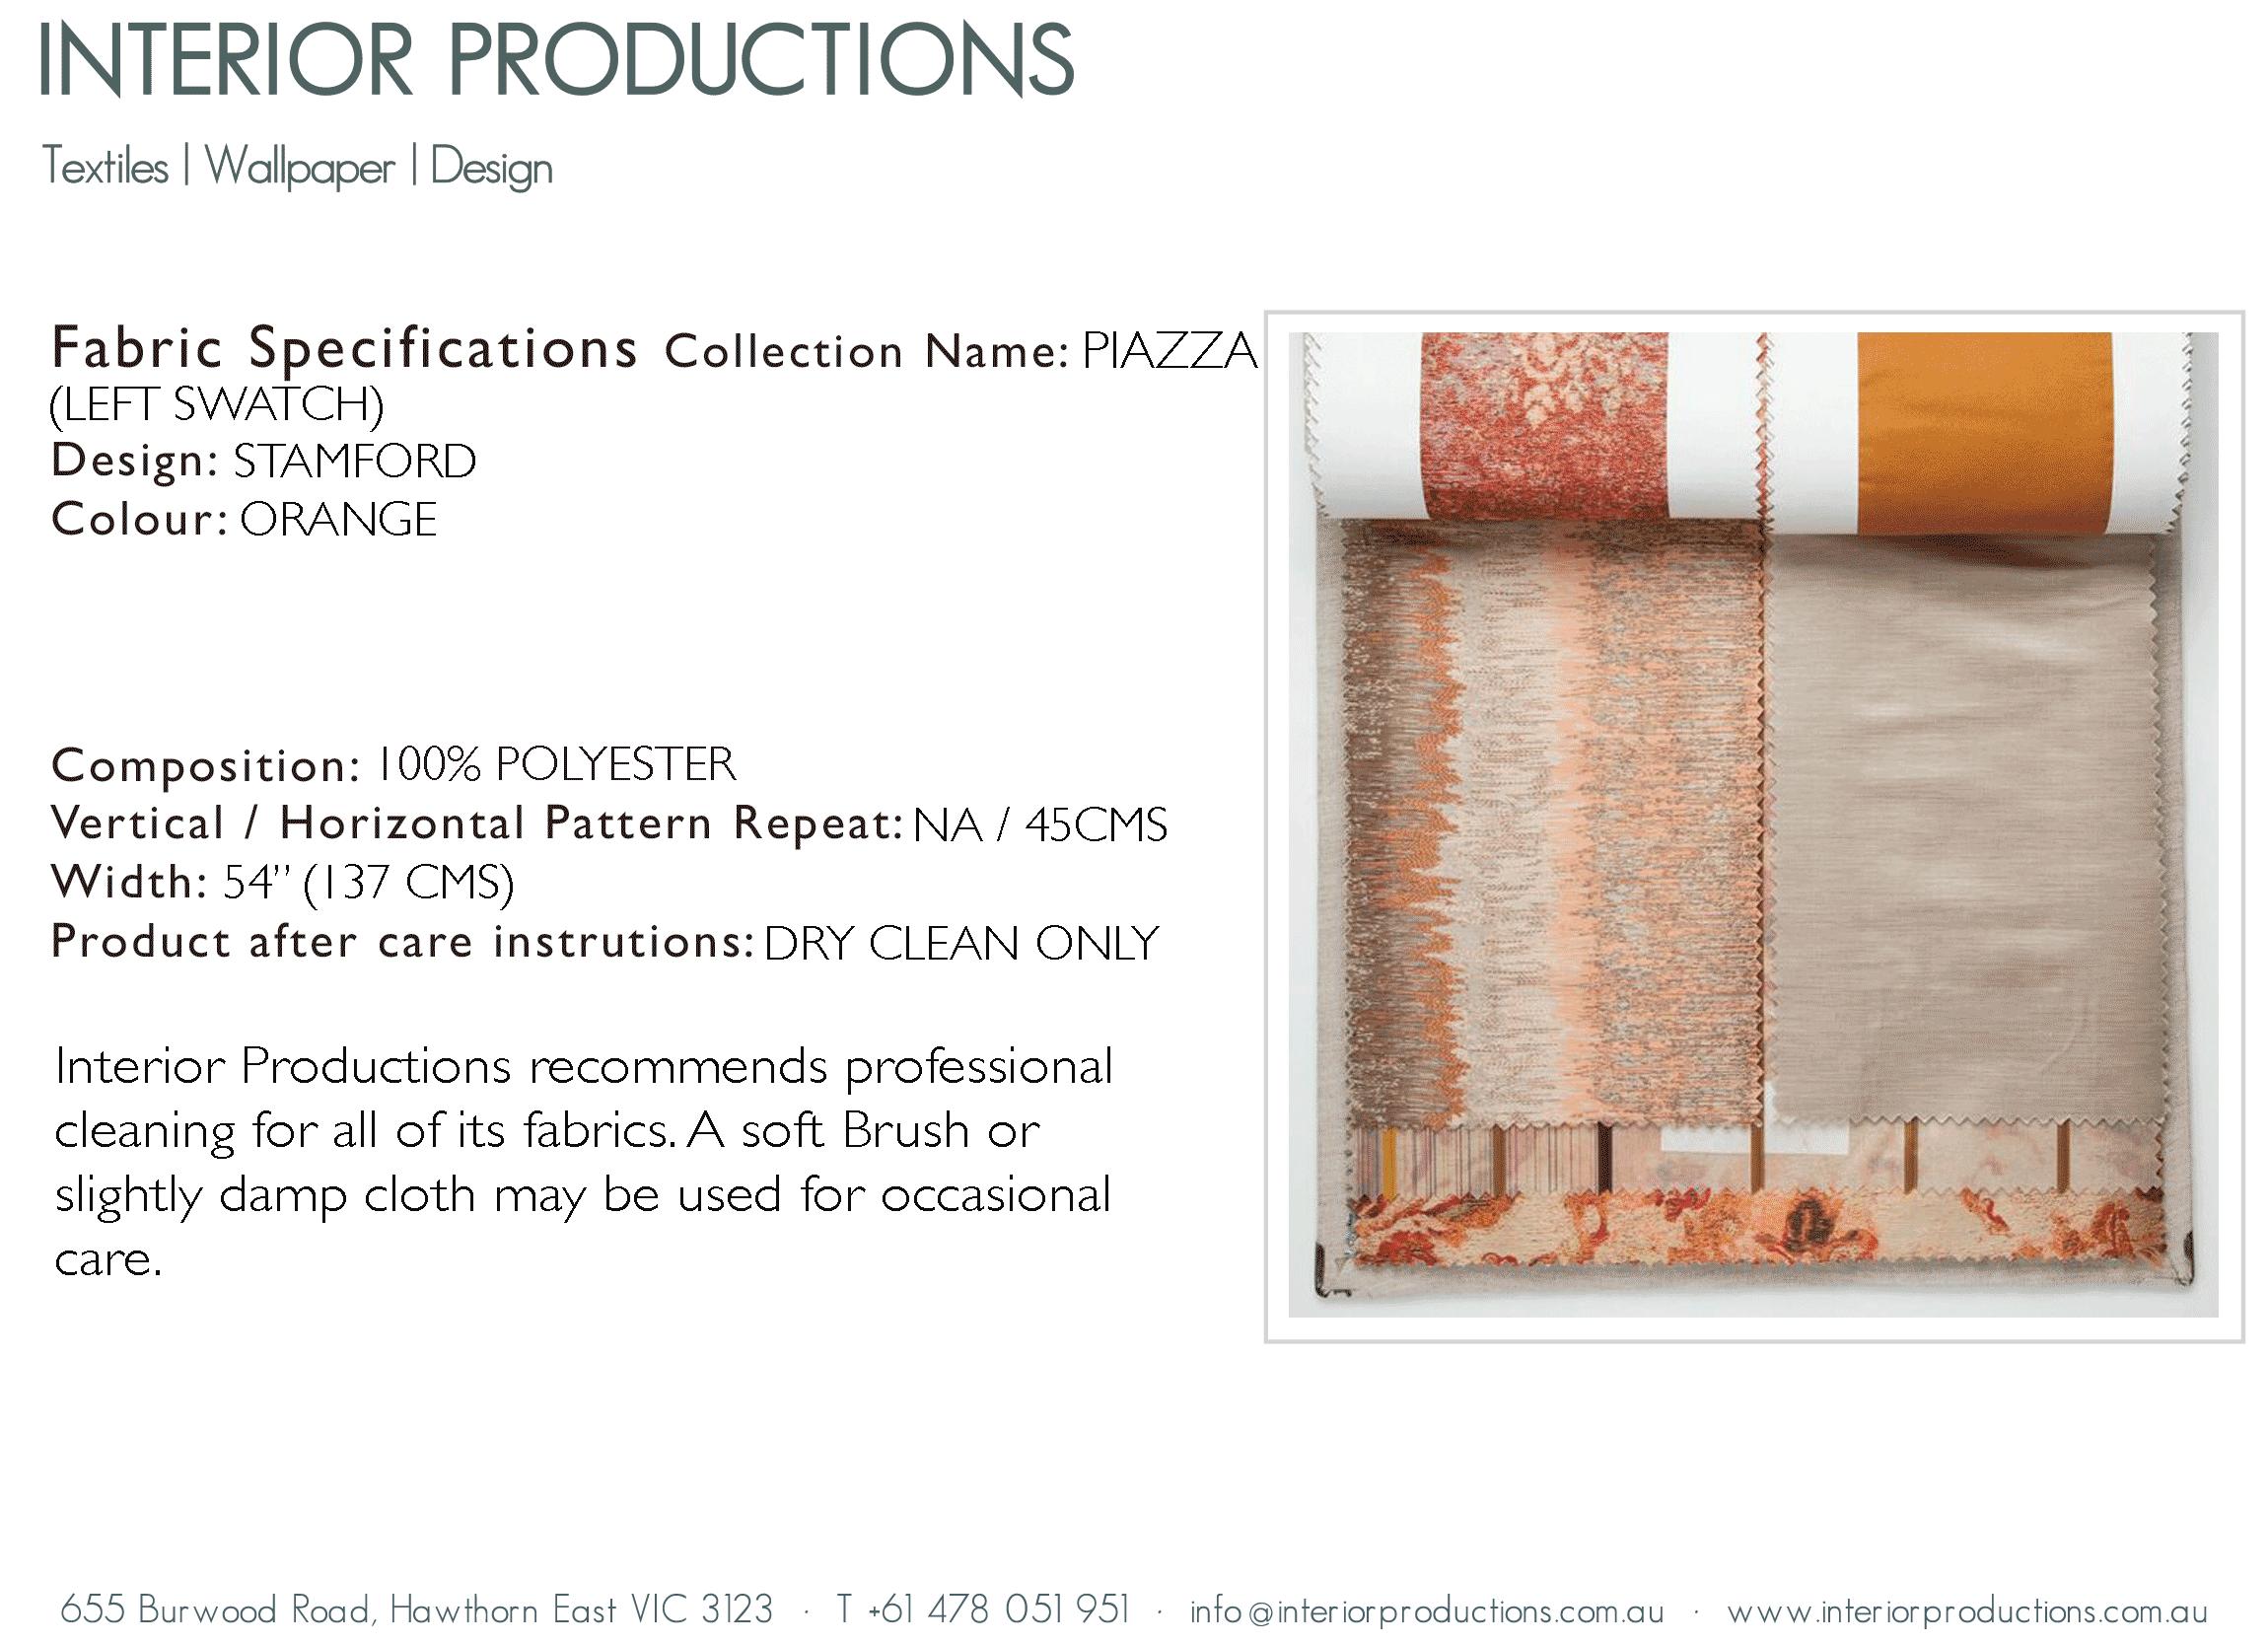 interior_productions_STAMFORD---ORANGE